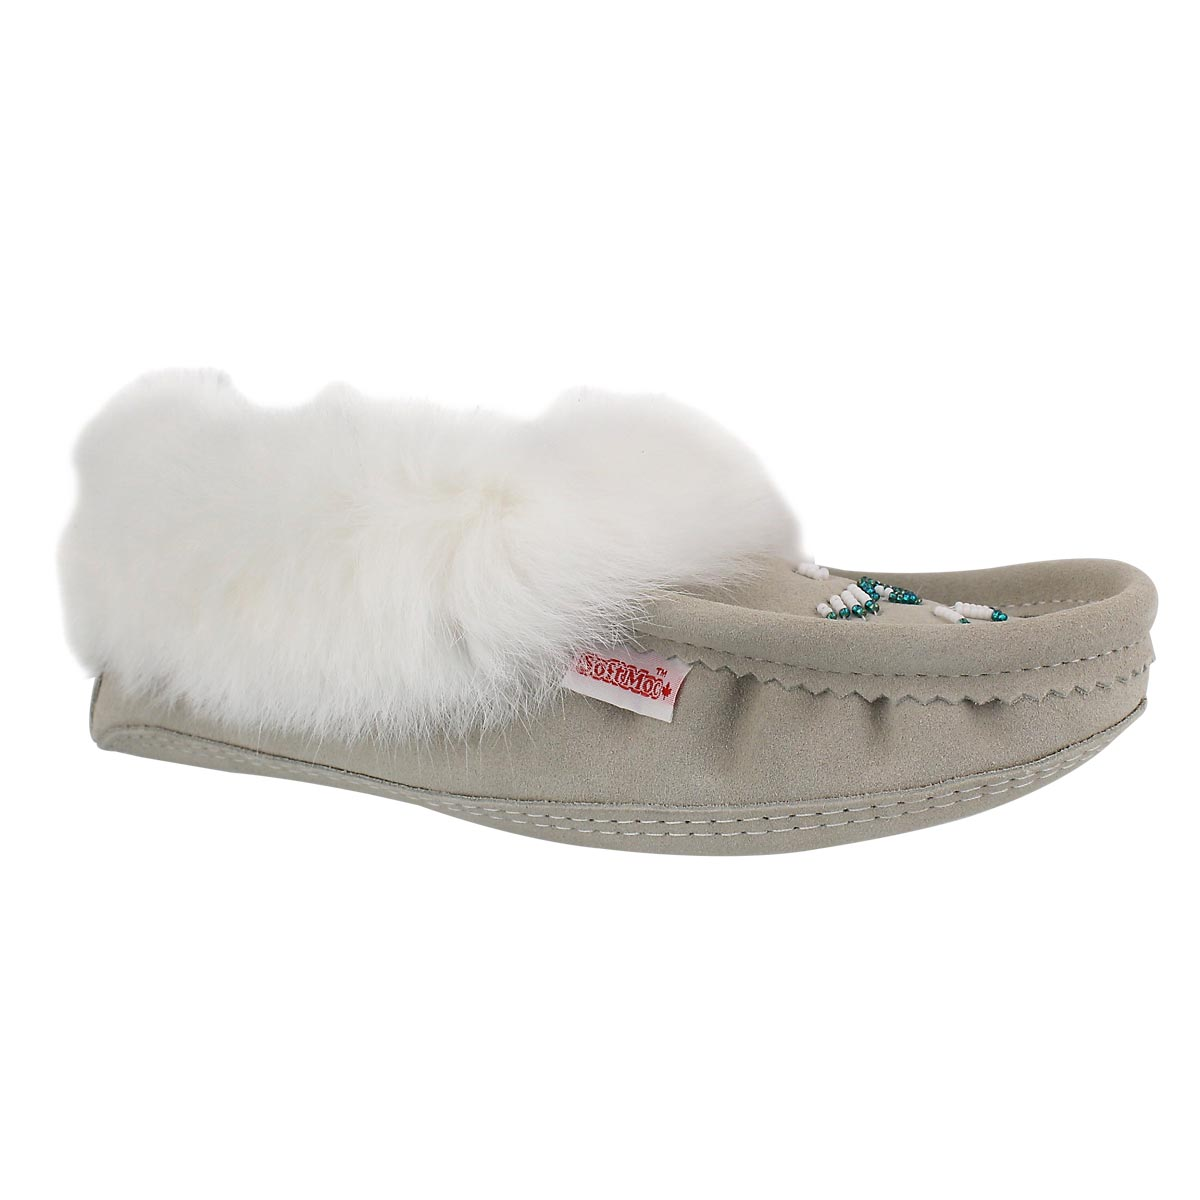 Women's 652 ice rabbit fur moccasins